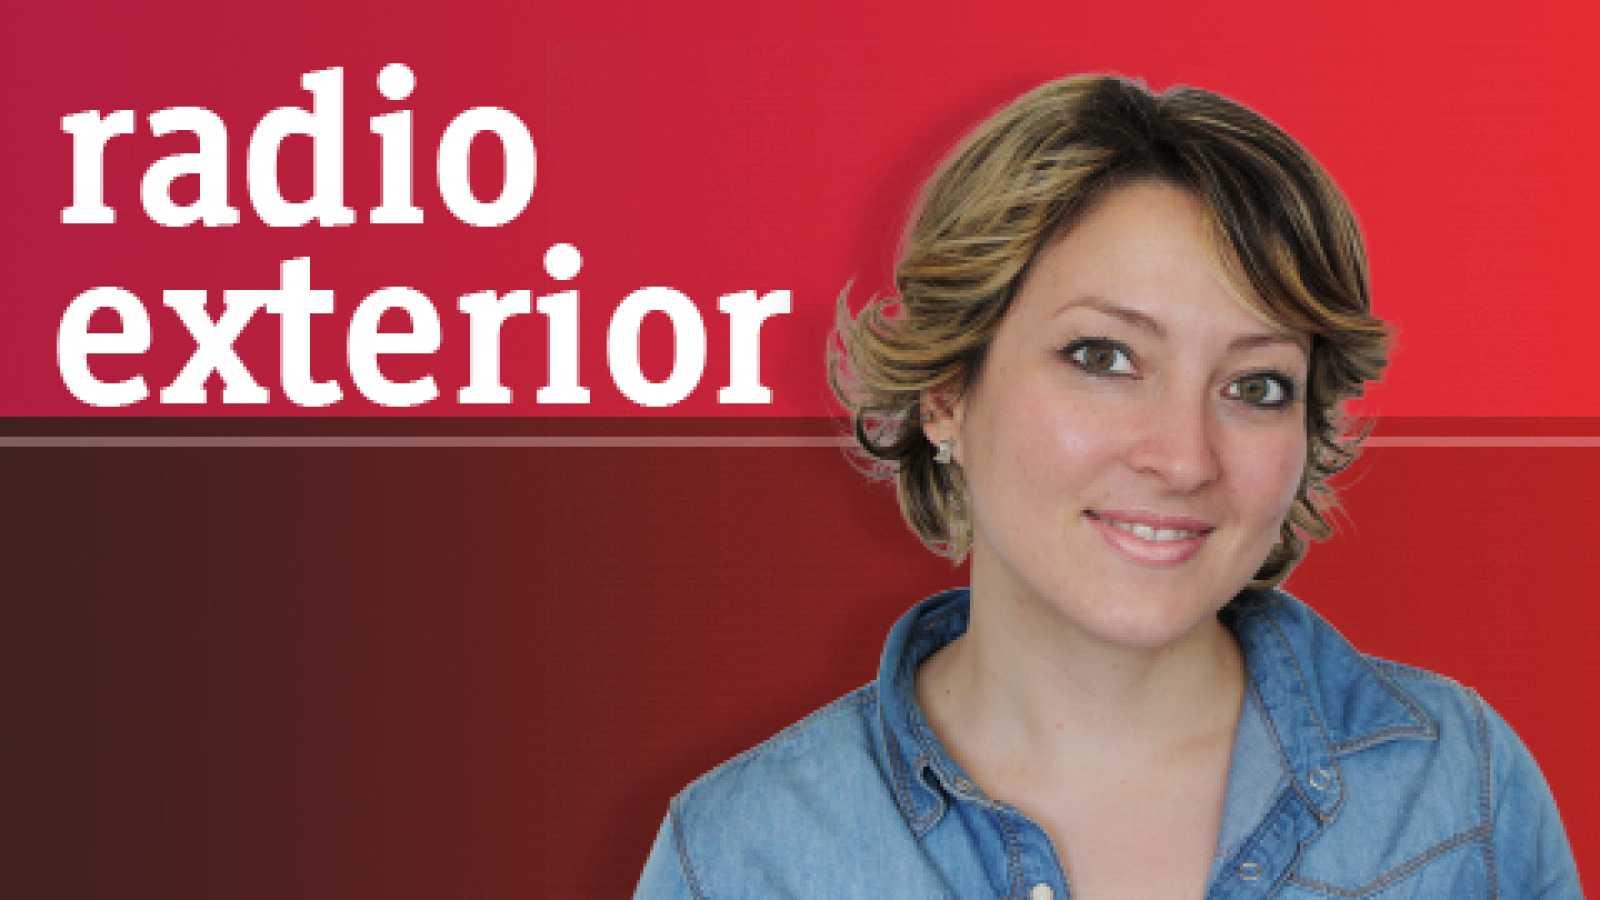 Cultura con Ñ - Jorge Alcolea - 07/12/19 - escuchar ahora